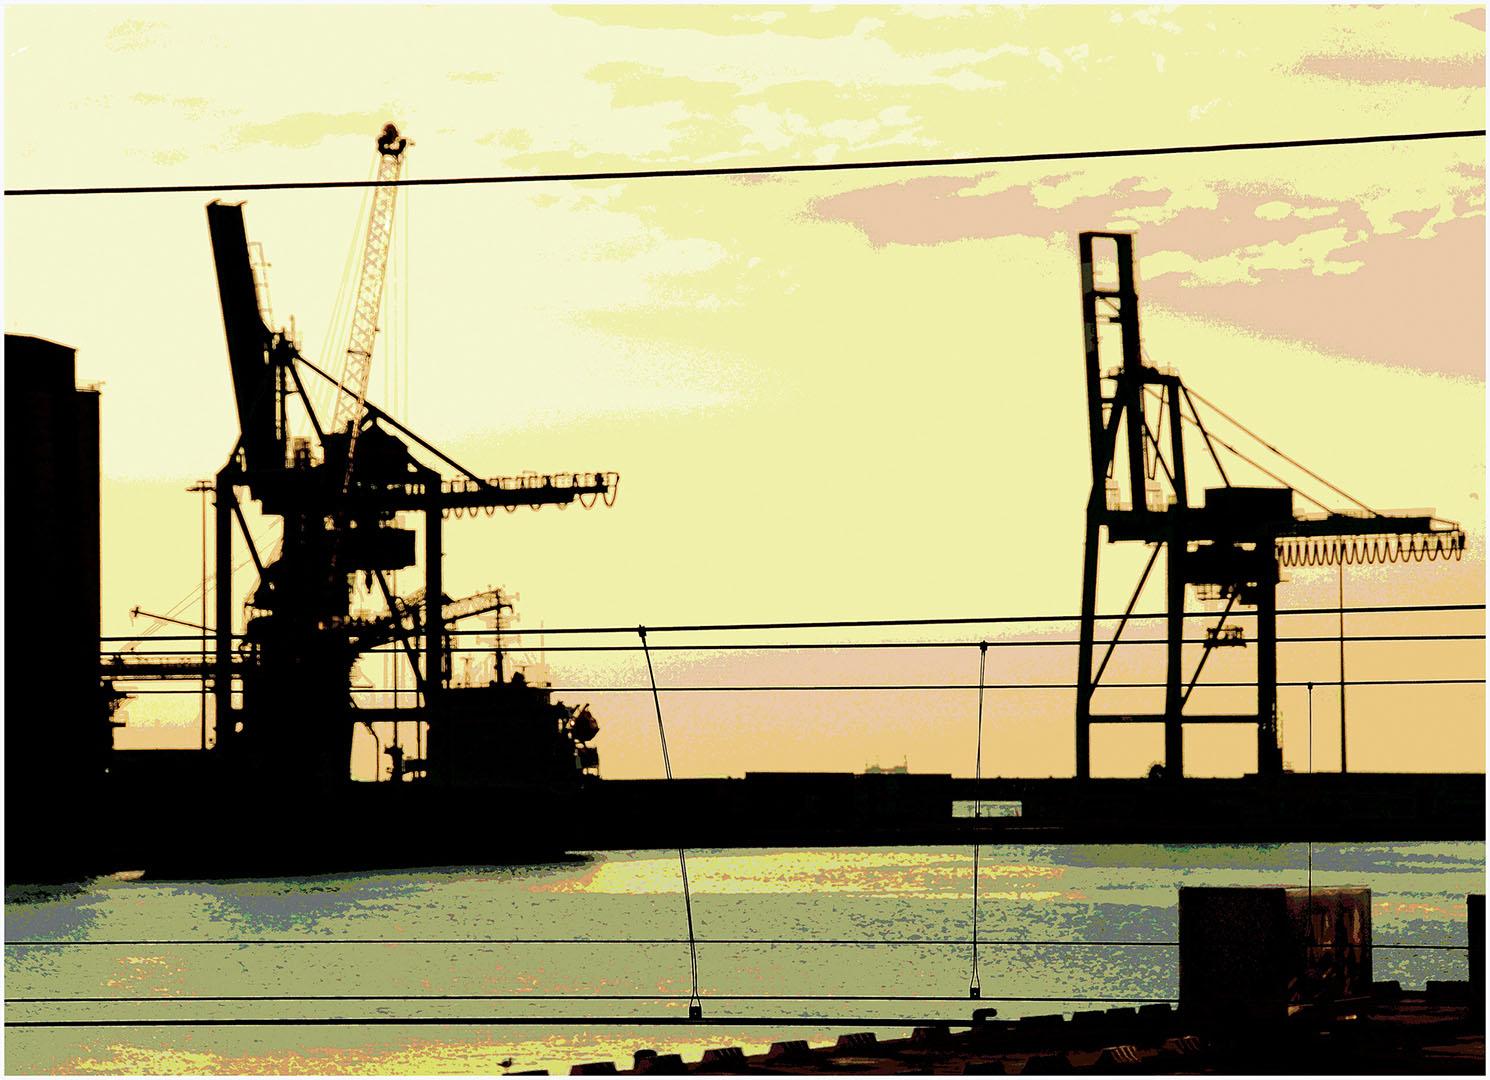 Industrial_Settings_091_I14.5.11